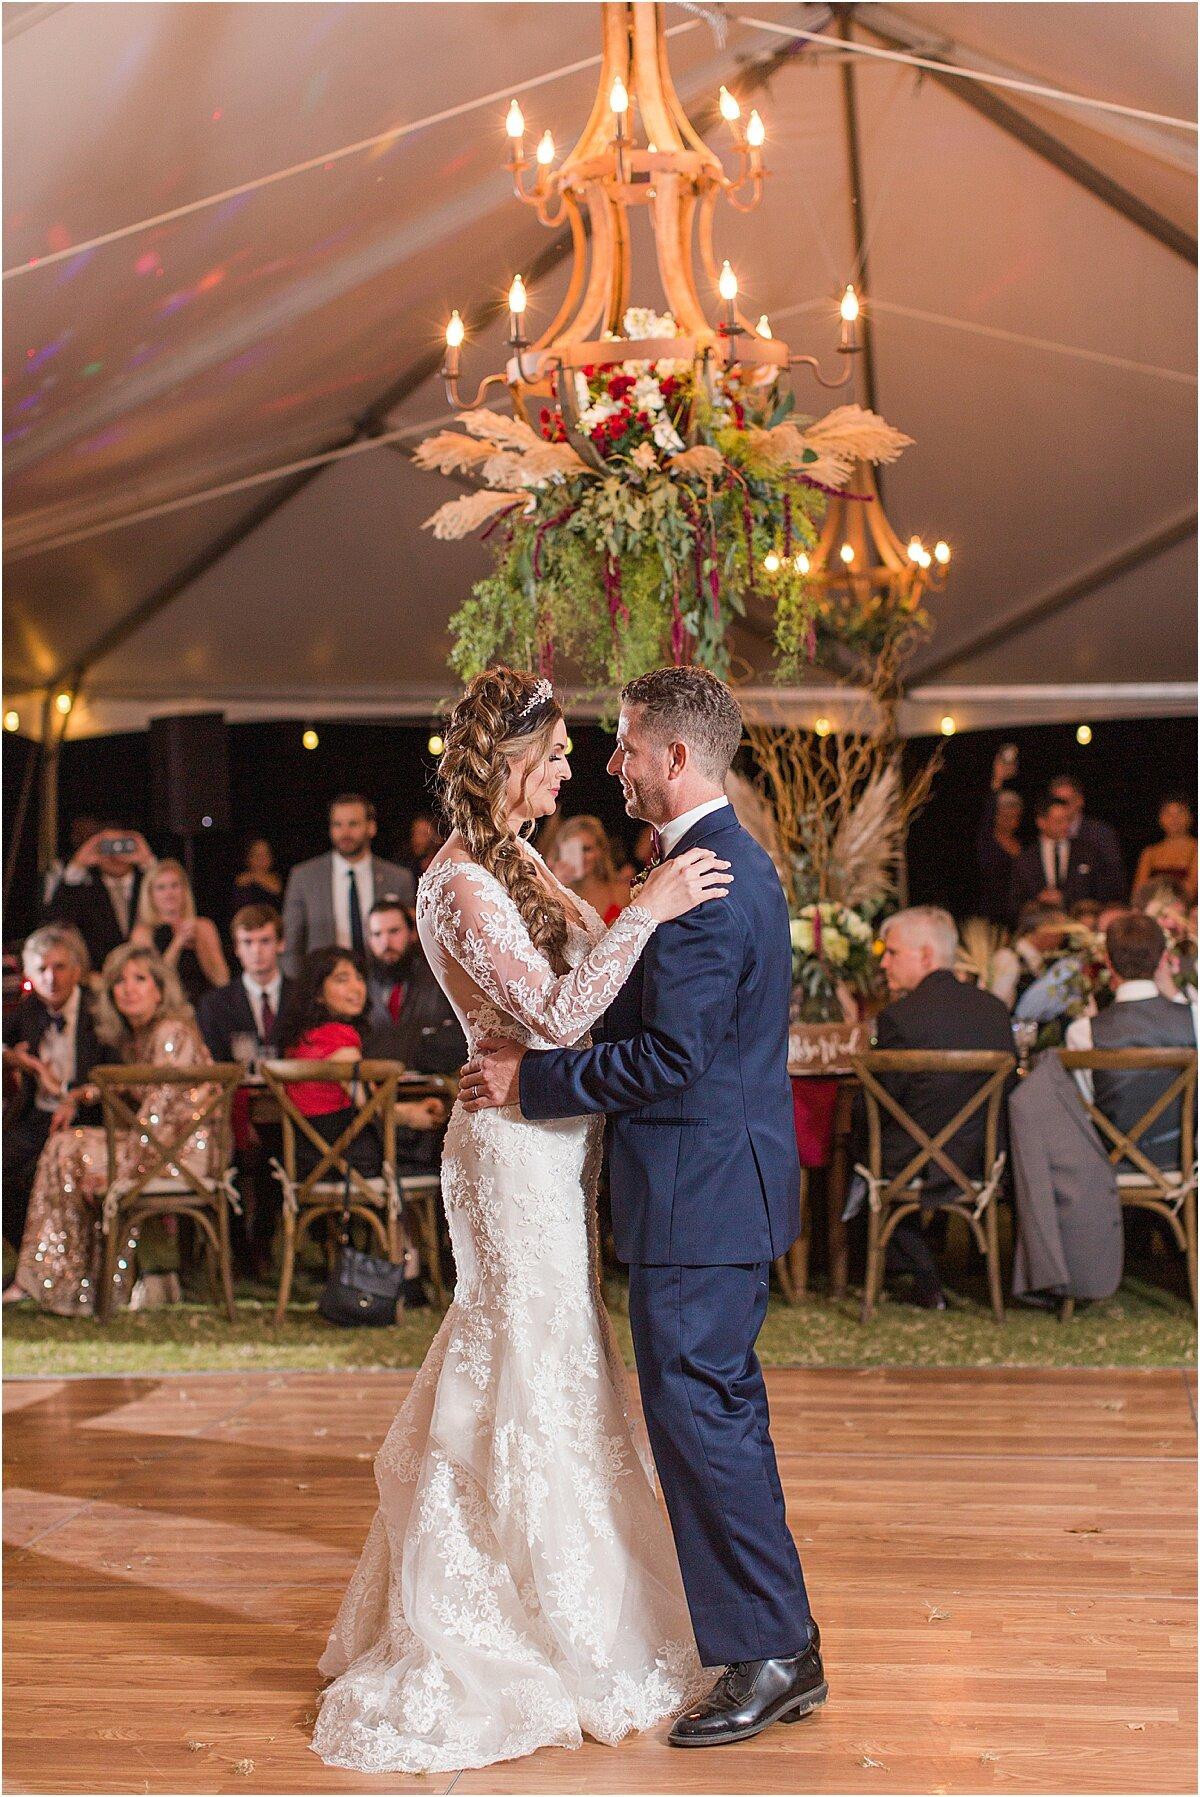 Jersey_Ga_Wedding_Venues_Holly_L_Robbins_Photography_0115.jpg